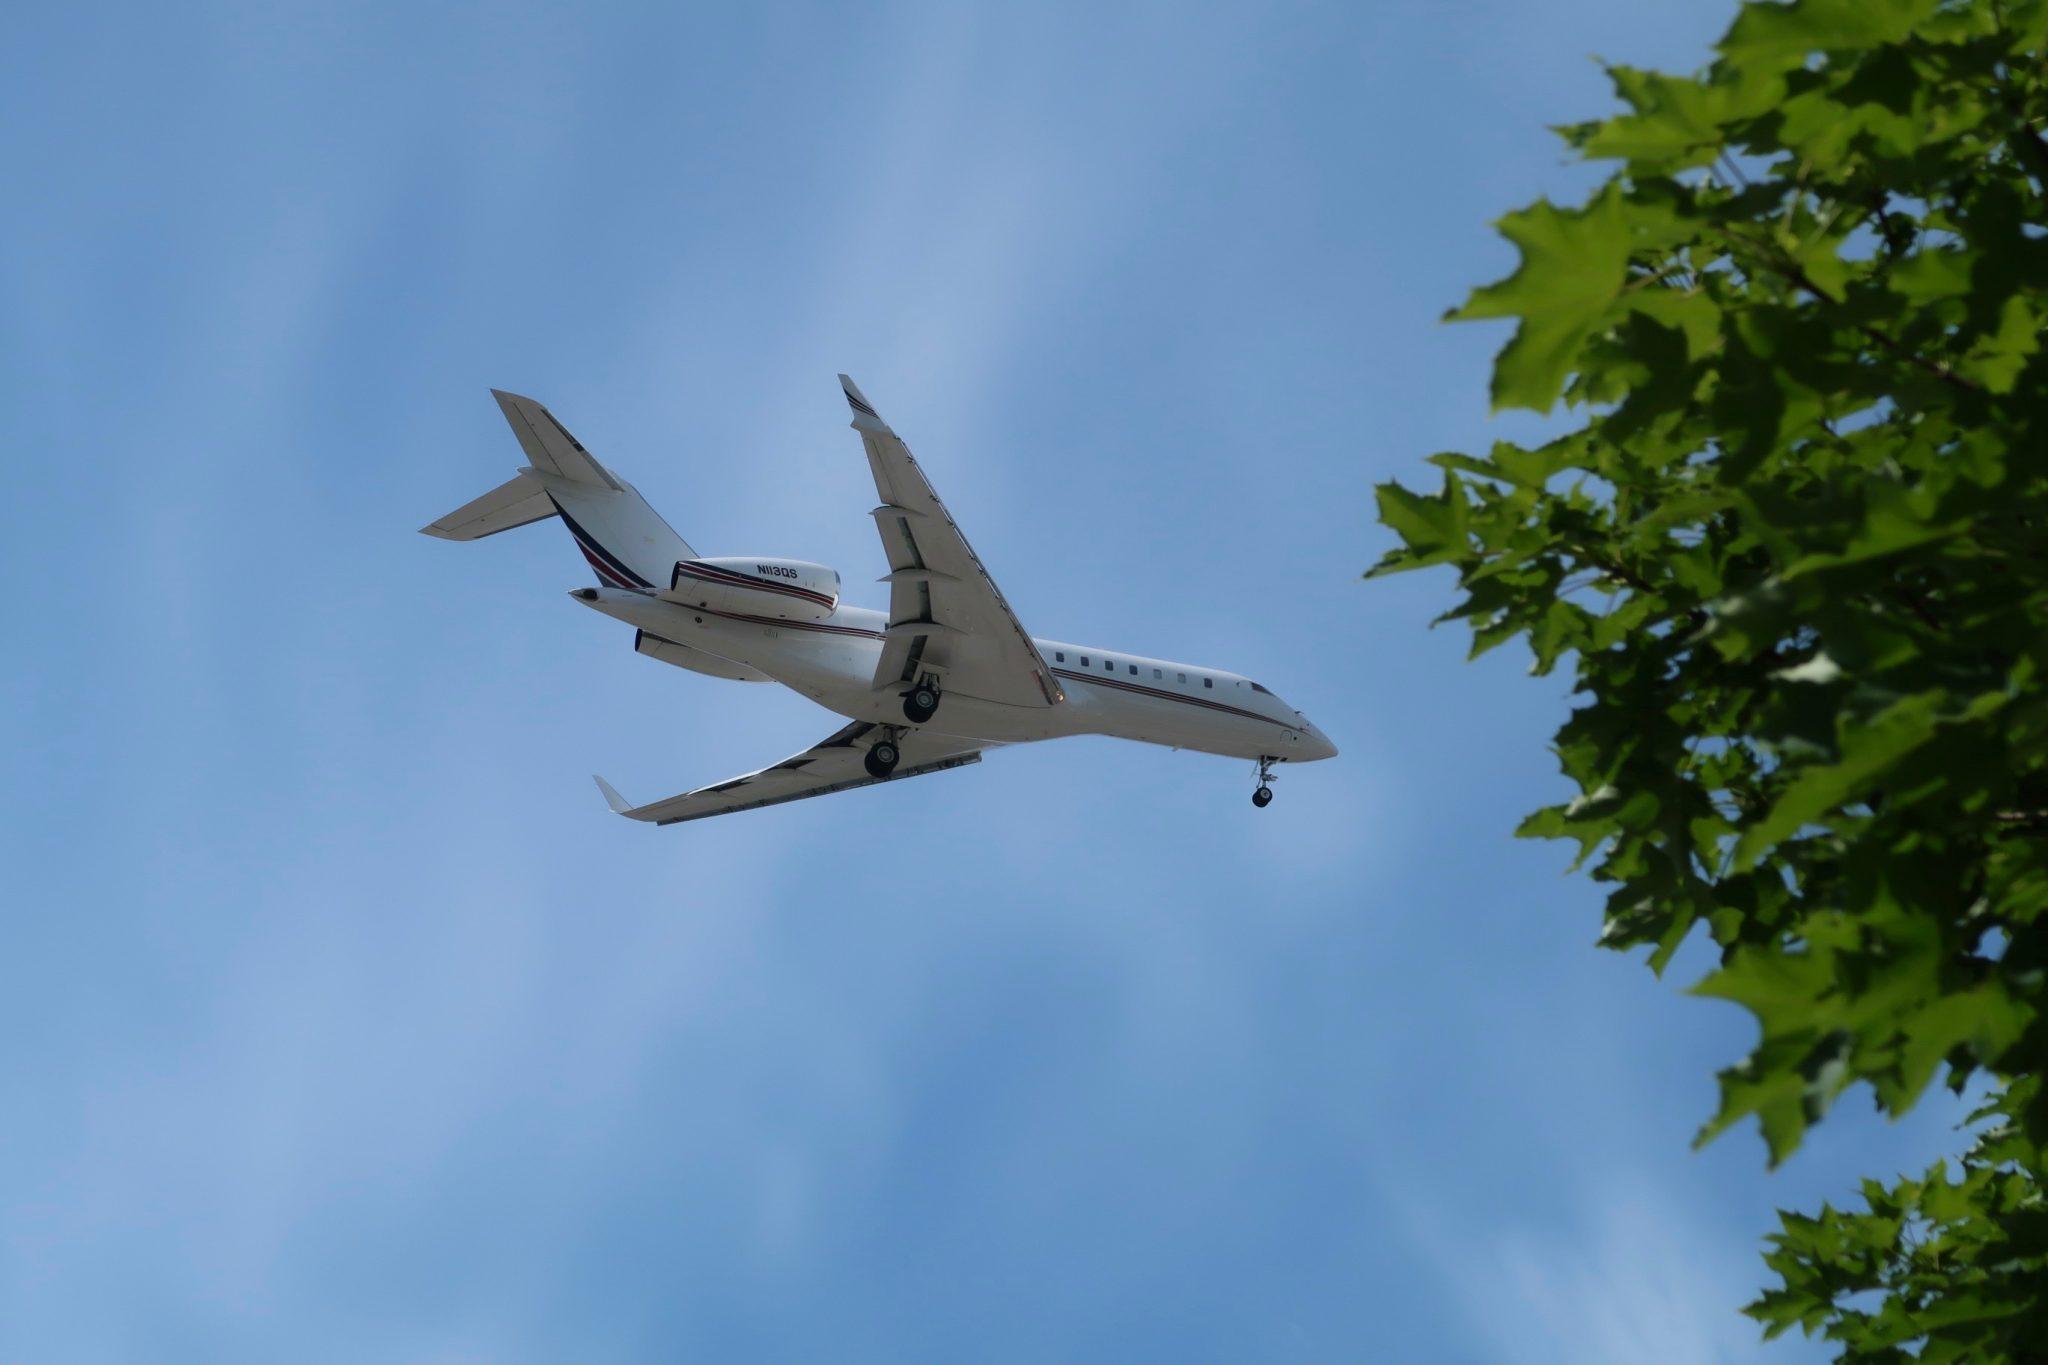 Tukholma Bromma lentokone